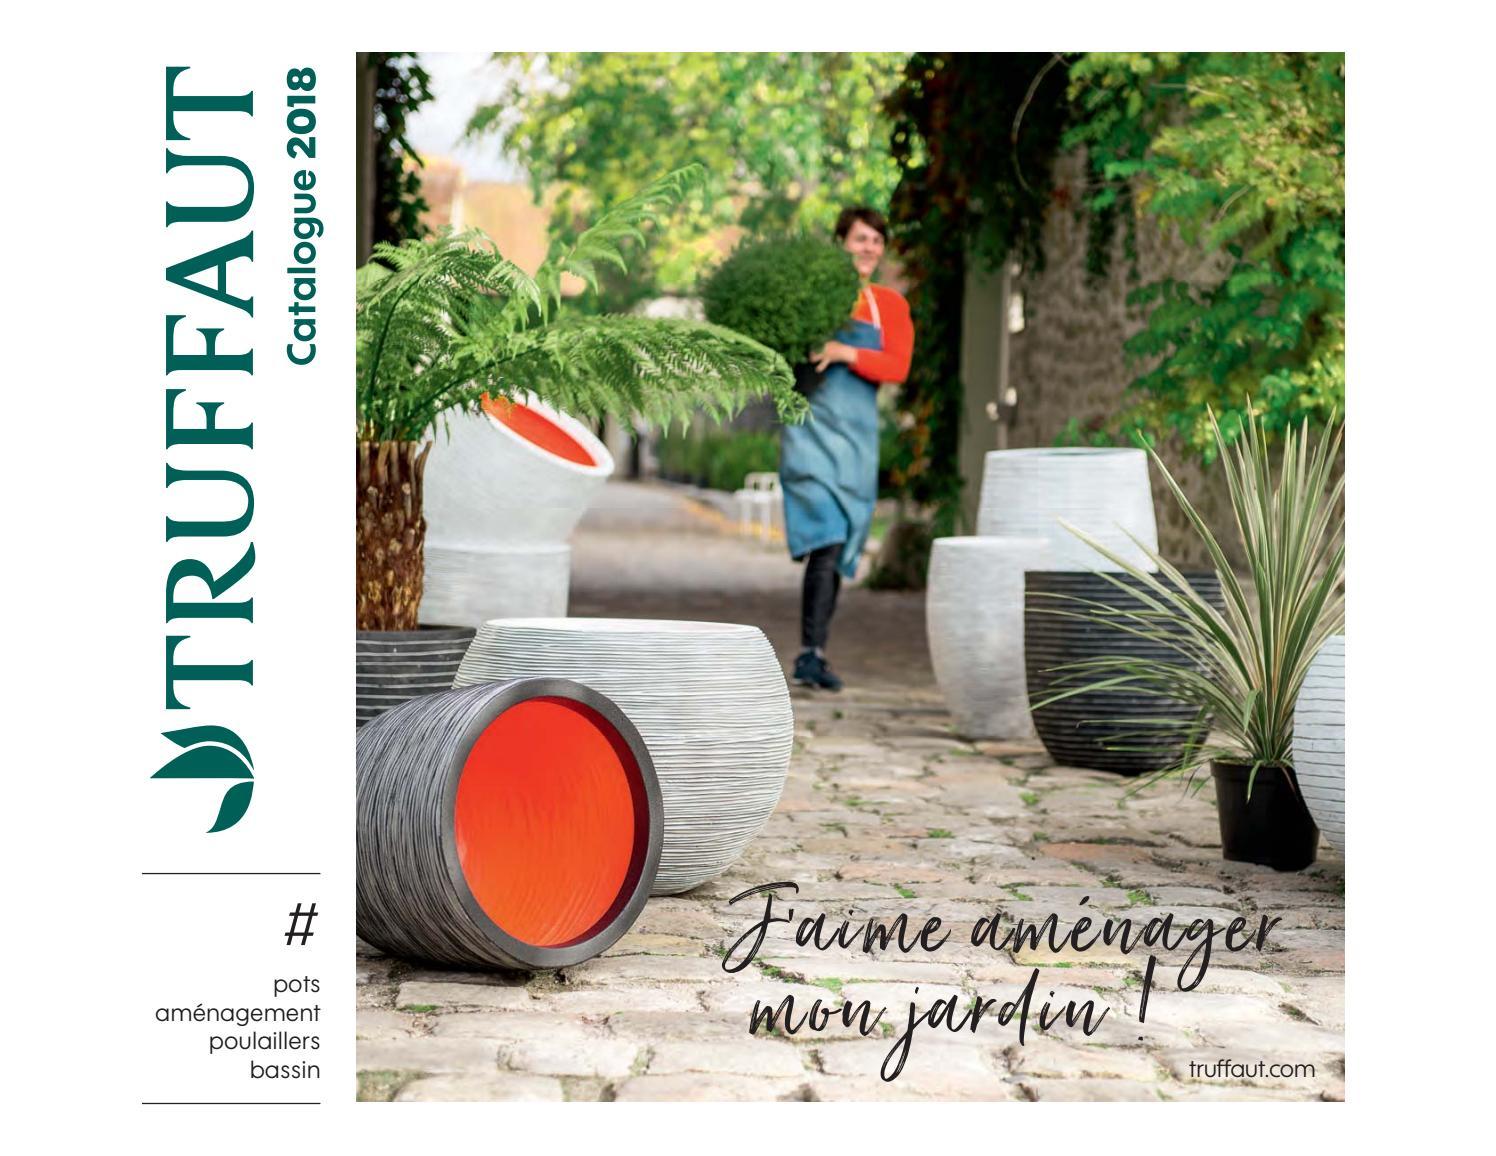 Catalogue Amenagement Jardin Terrasse Jardinerie Truffaut By Truffaut Issuu